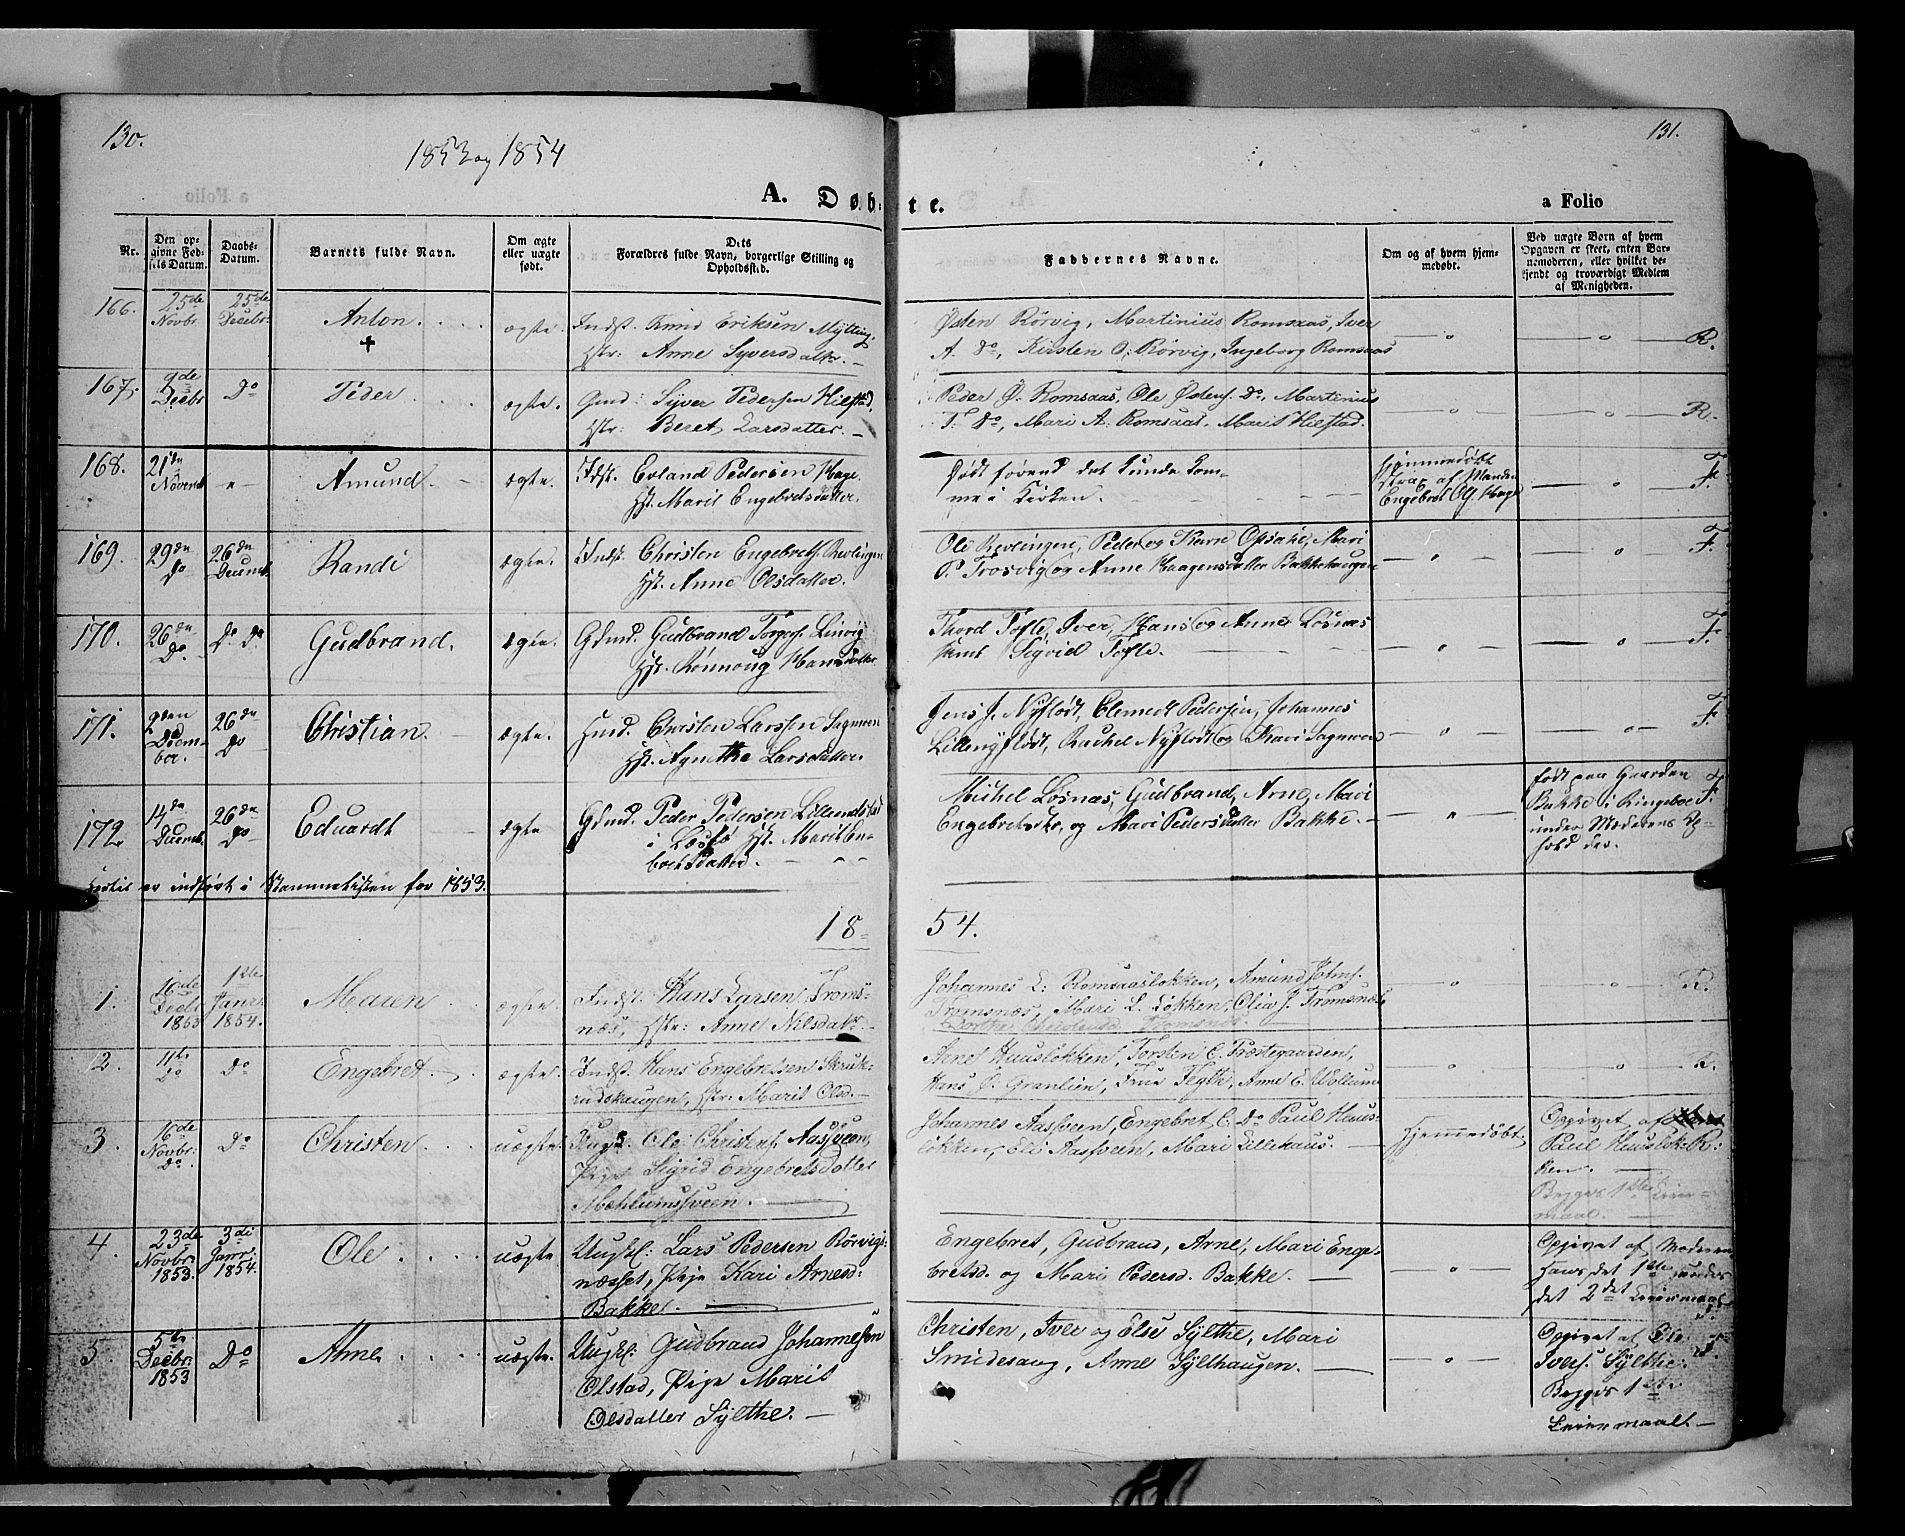 SAH, Ringebu prestekontor, Ministerialbok nr. 6, 1848-1859, s. 130-131